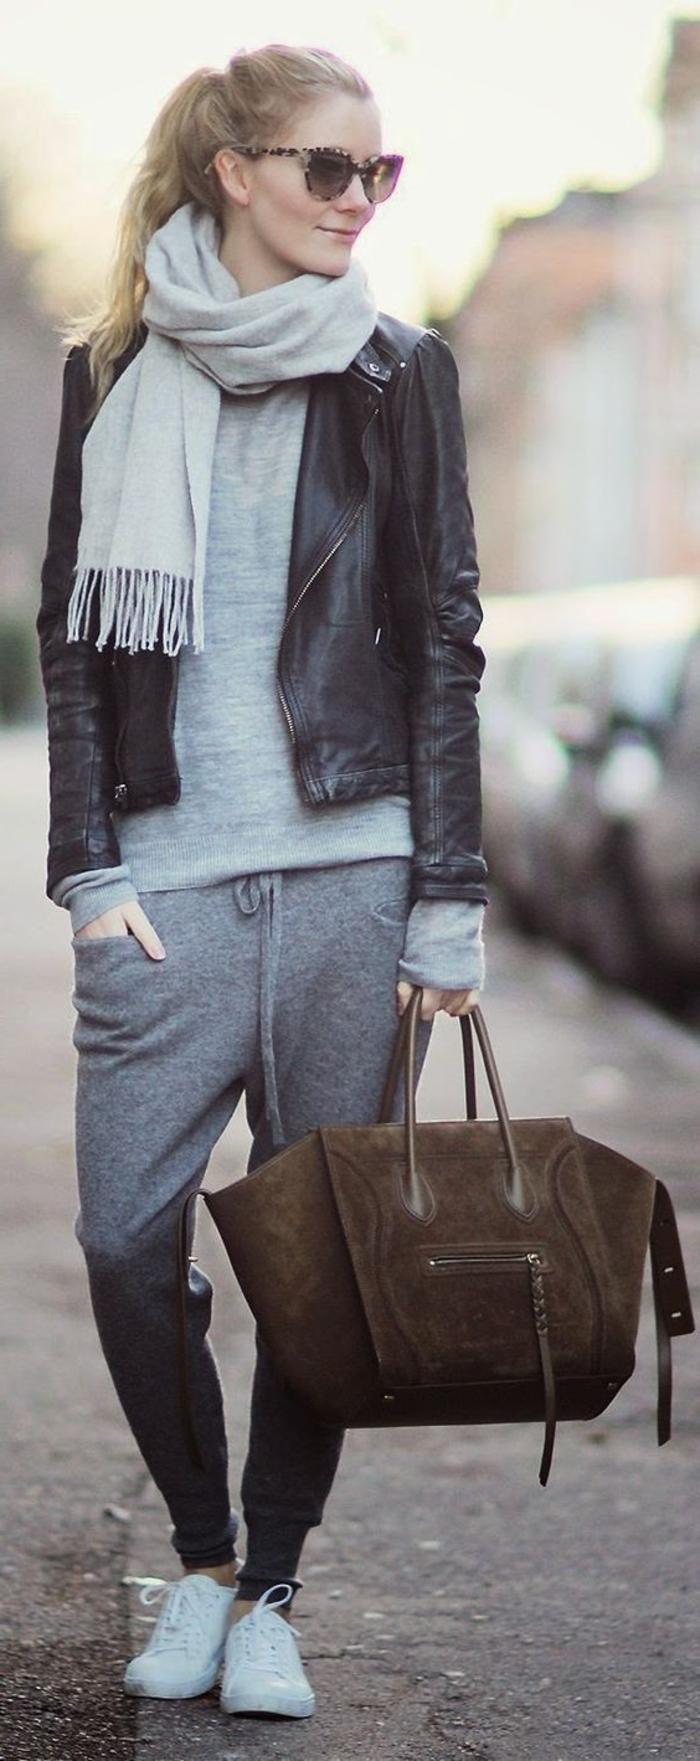 Outfit mit Jogginghose zum moderne accessoires kombinieren